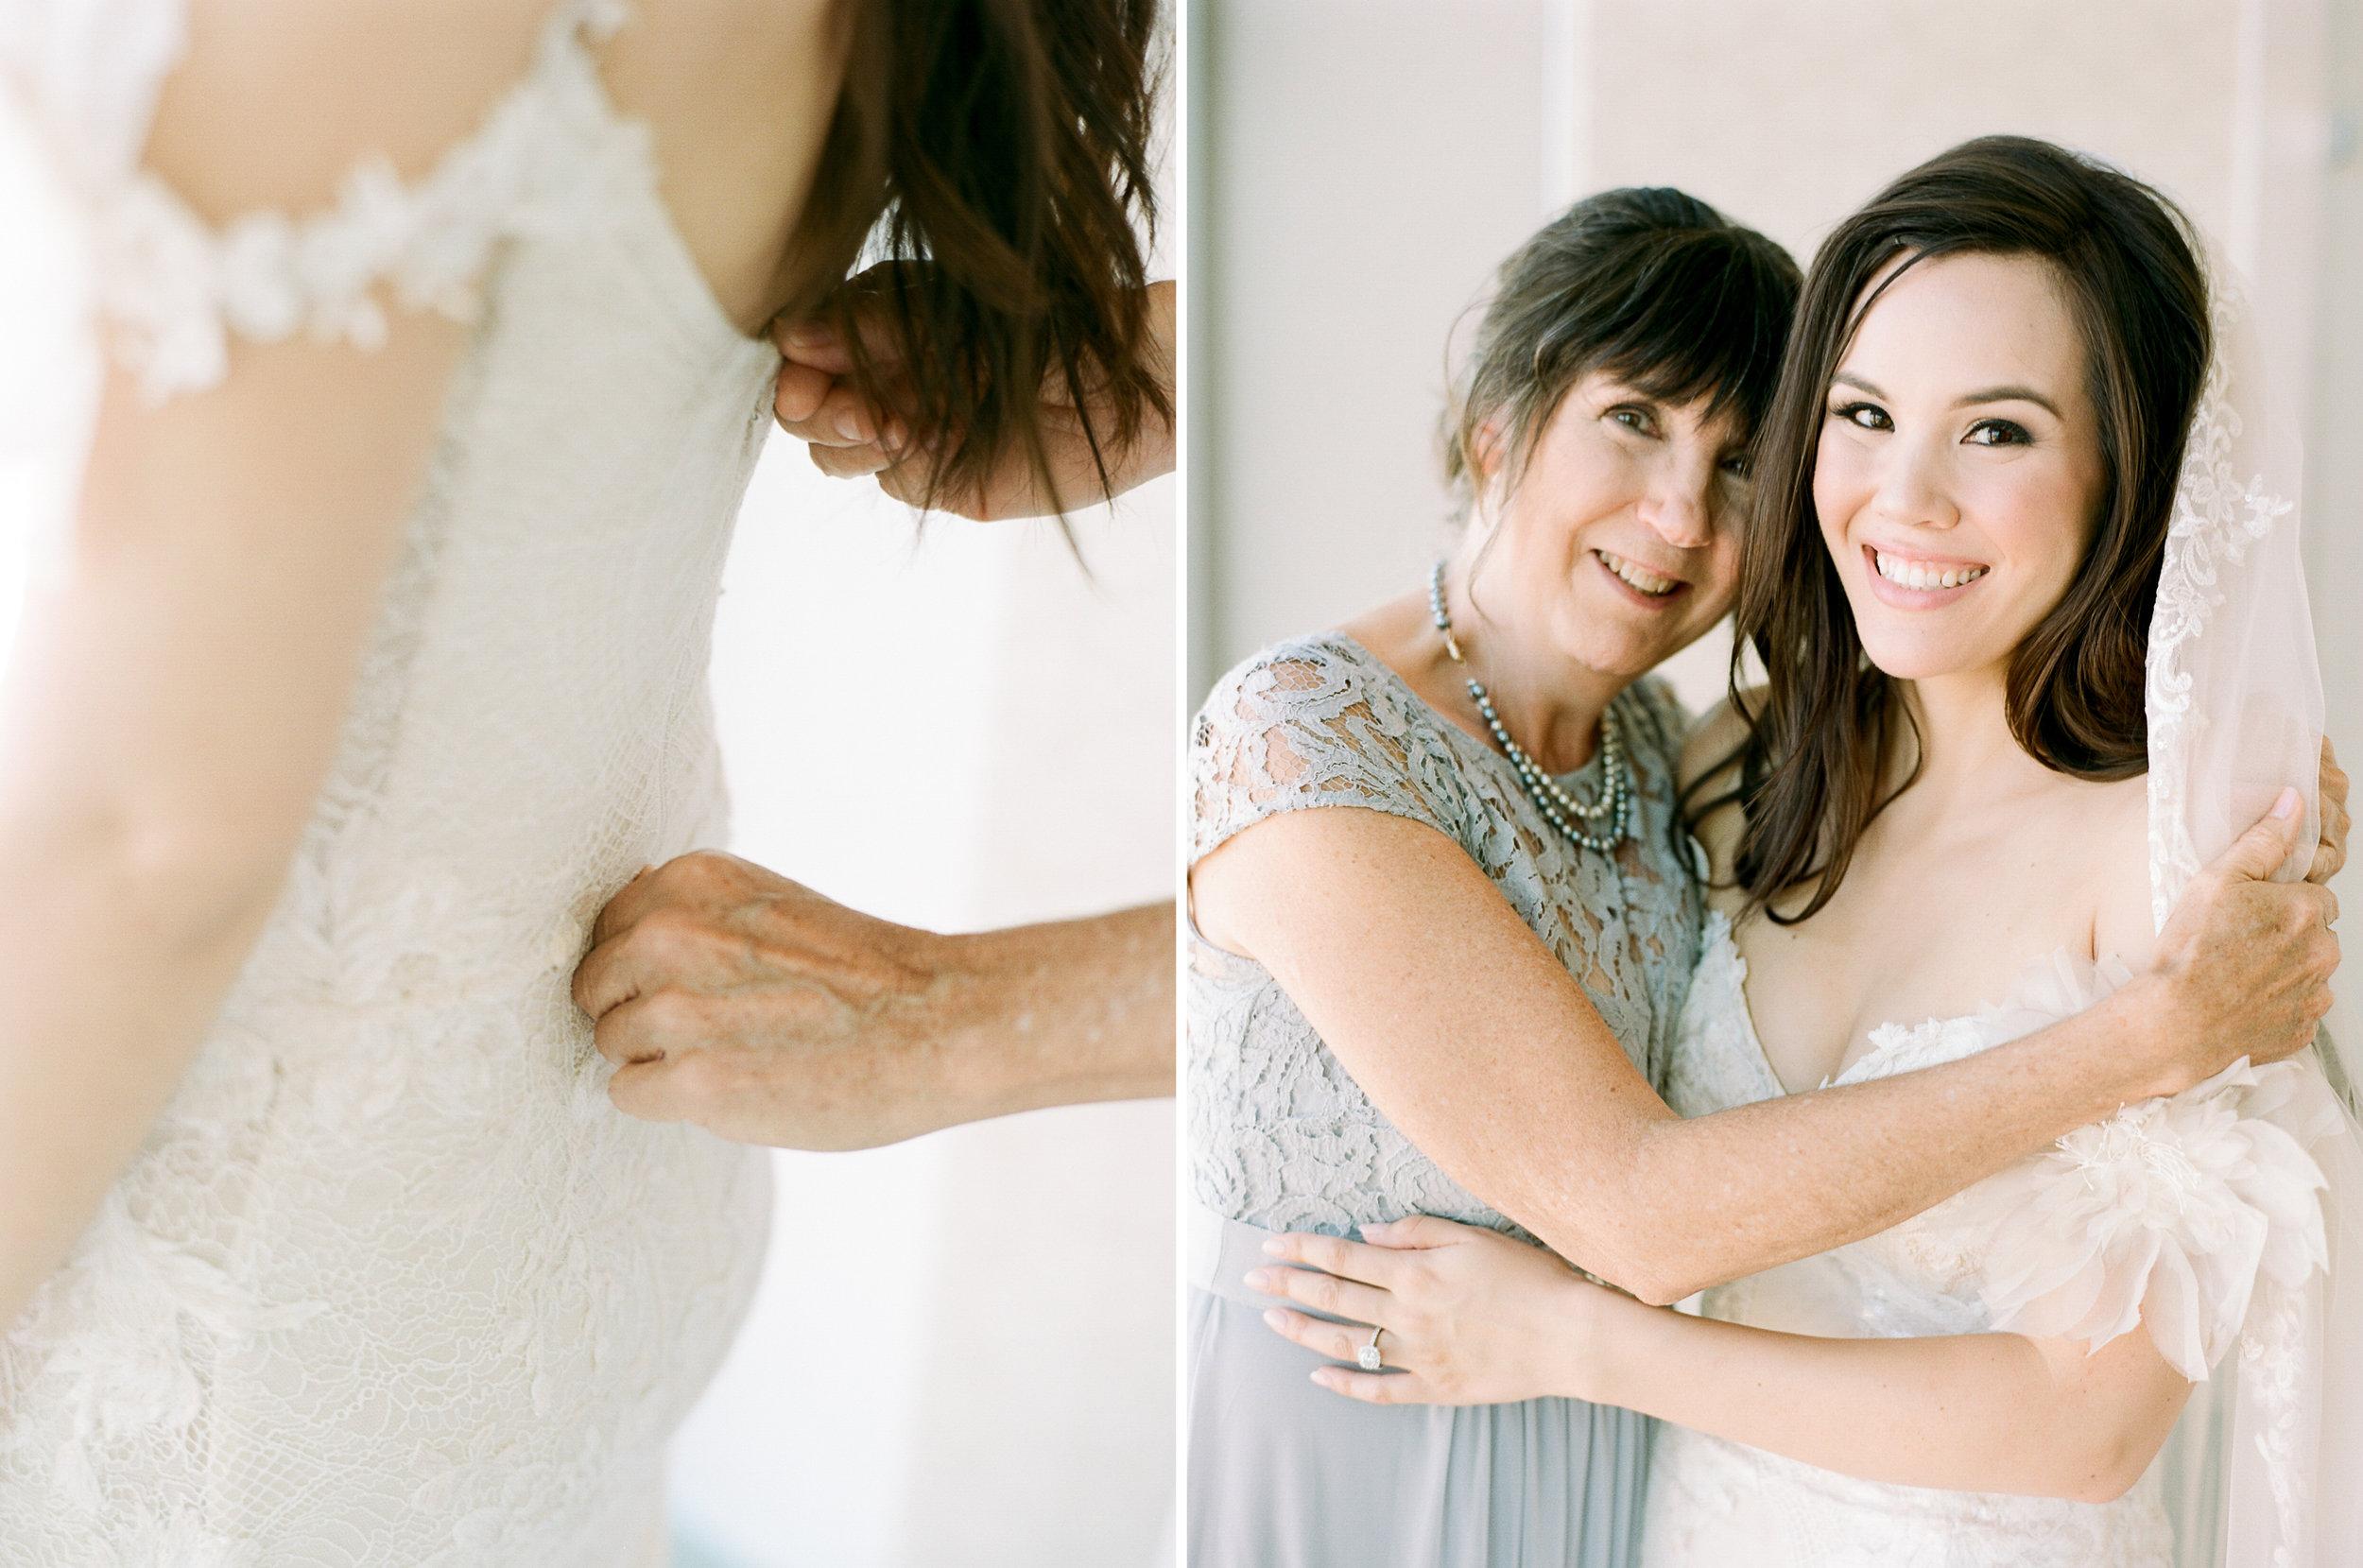 Martha-Stewart-Wedding-Dana-Fernandez-Photography-Josh-Texas-Film-Houston-Wedding-Fine-Art-Photographer-McGovern-Centennial-Gardens-Top-Best-101.jpg